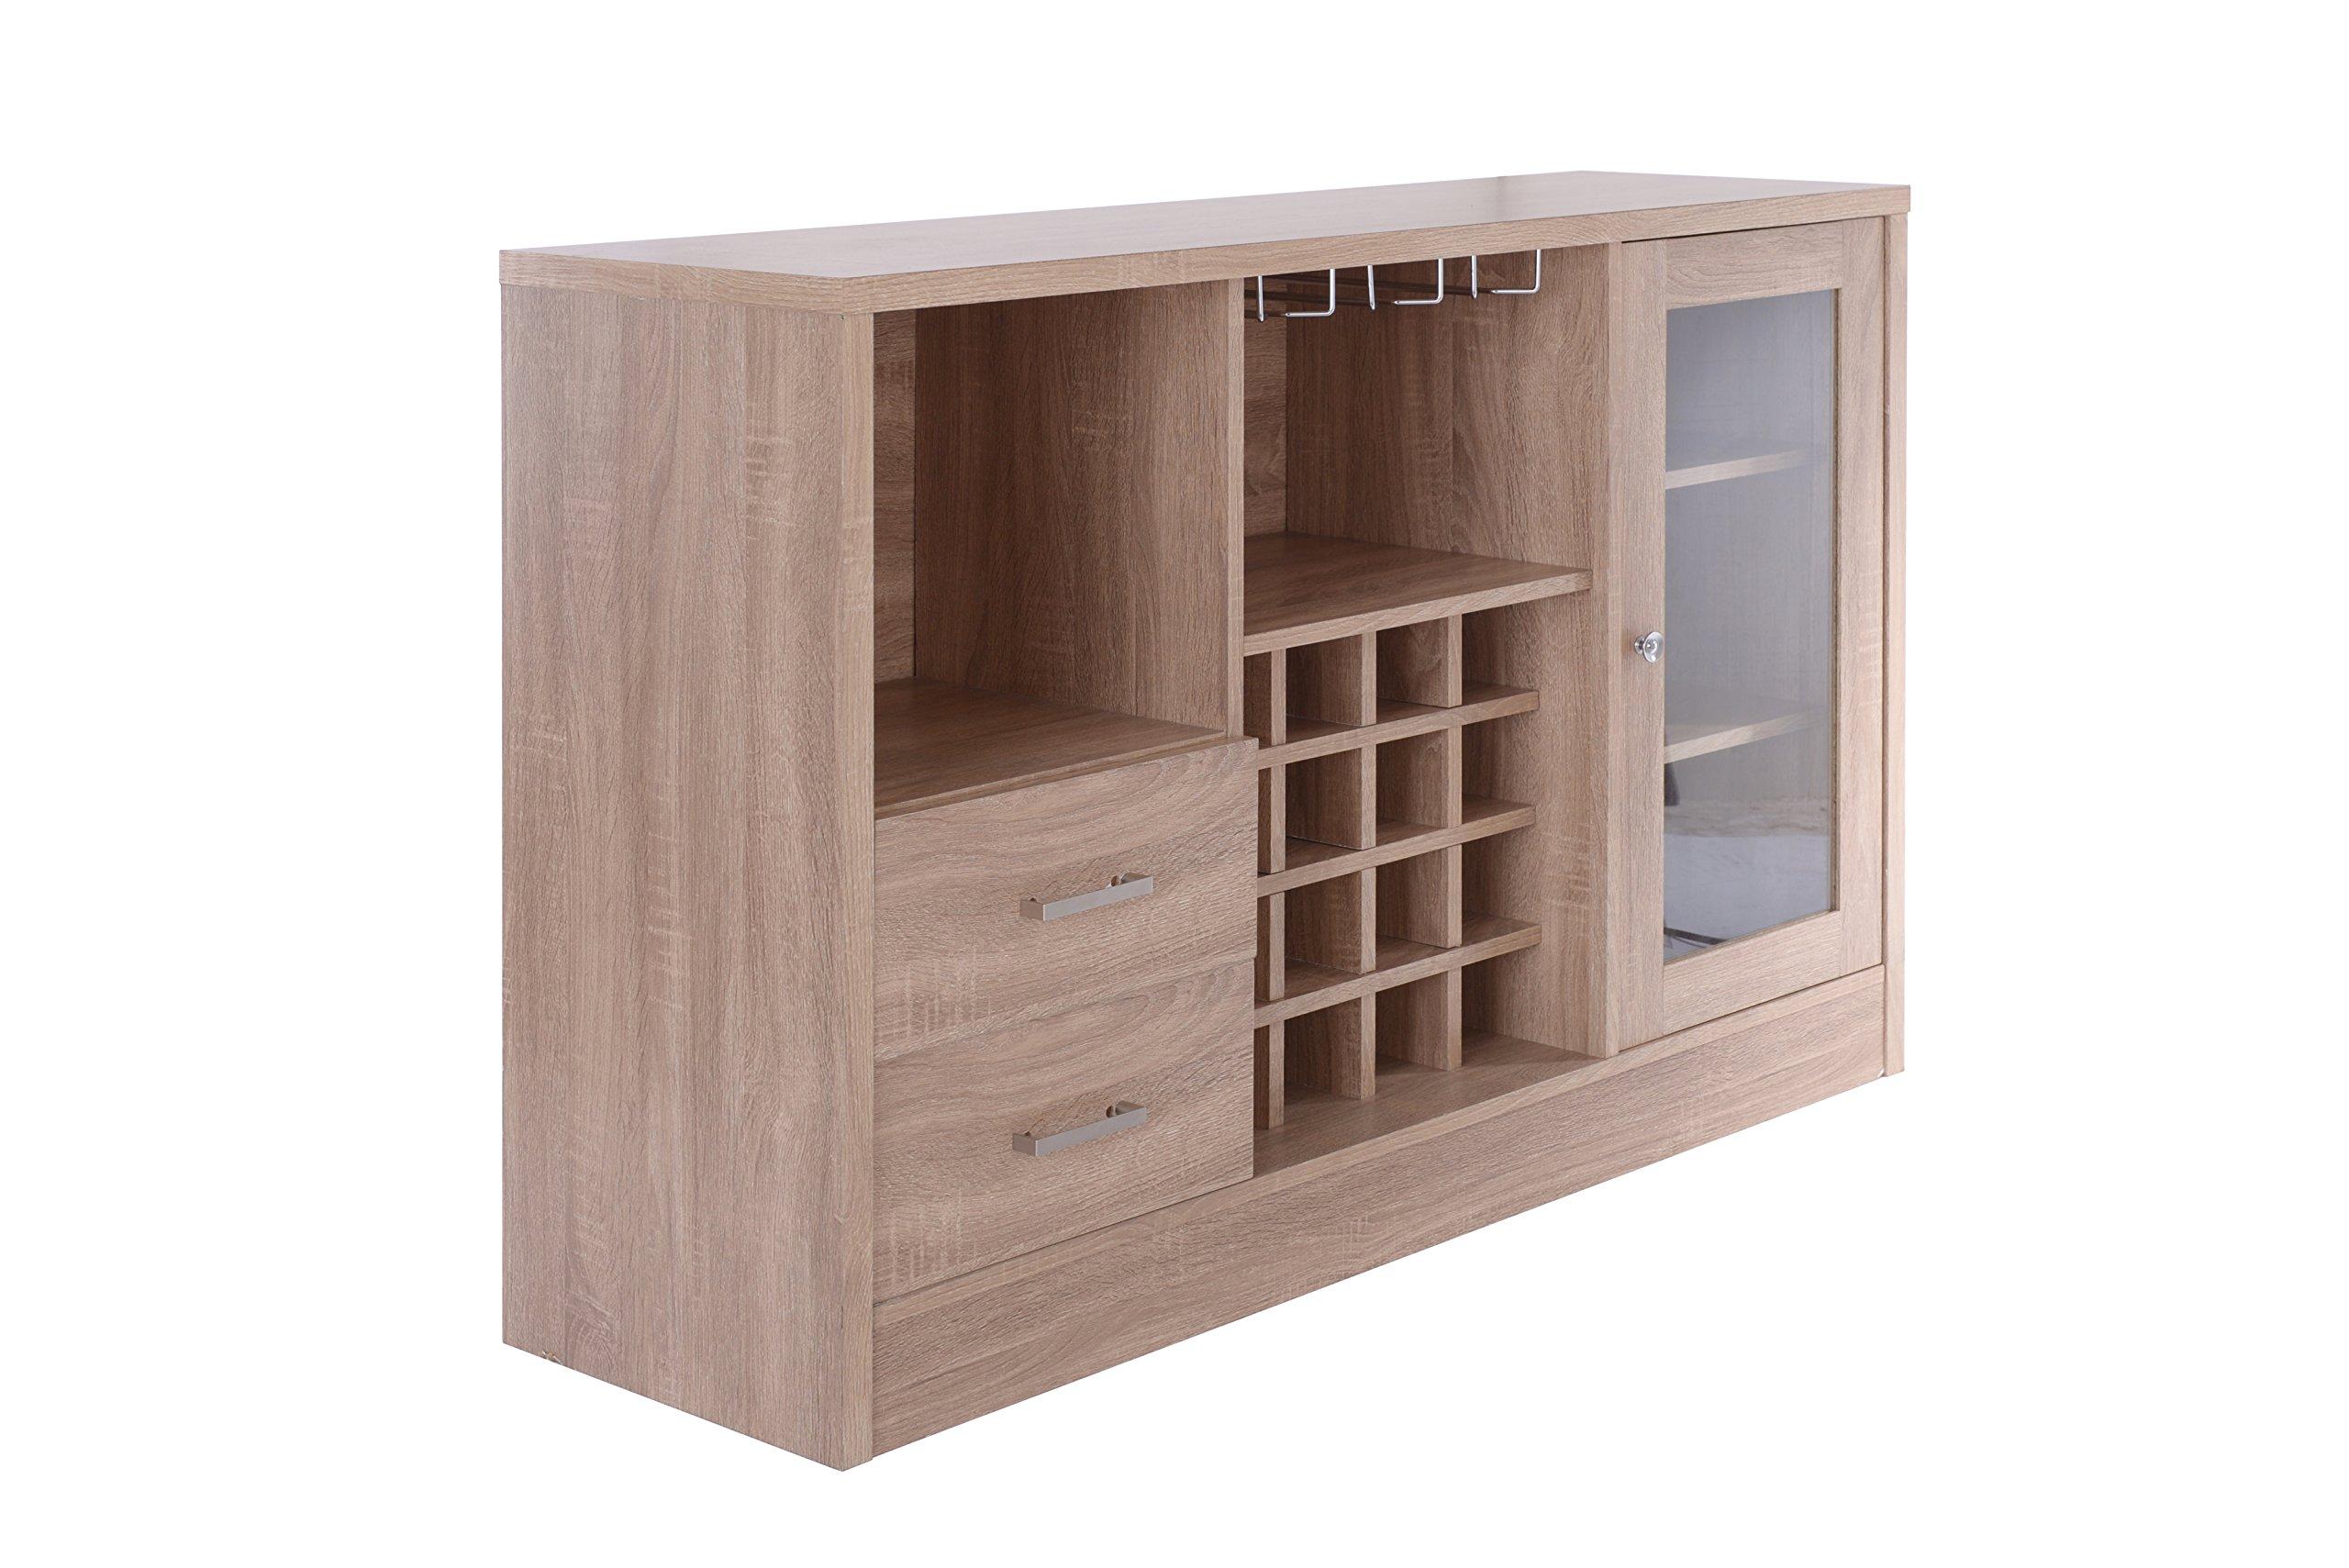 Acme Furniture 72635 Joice Rustic Oak Server by Acme Furniture (Image #1)